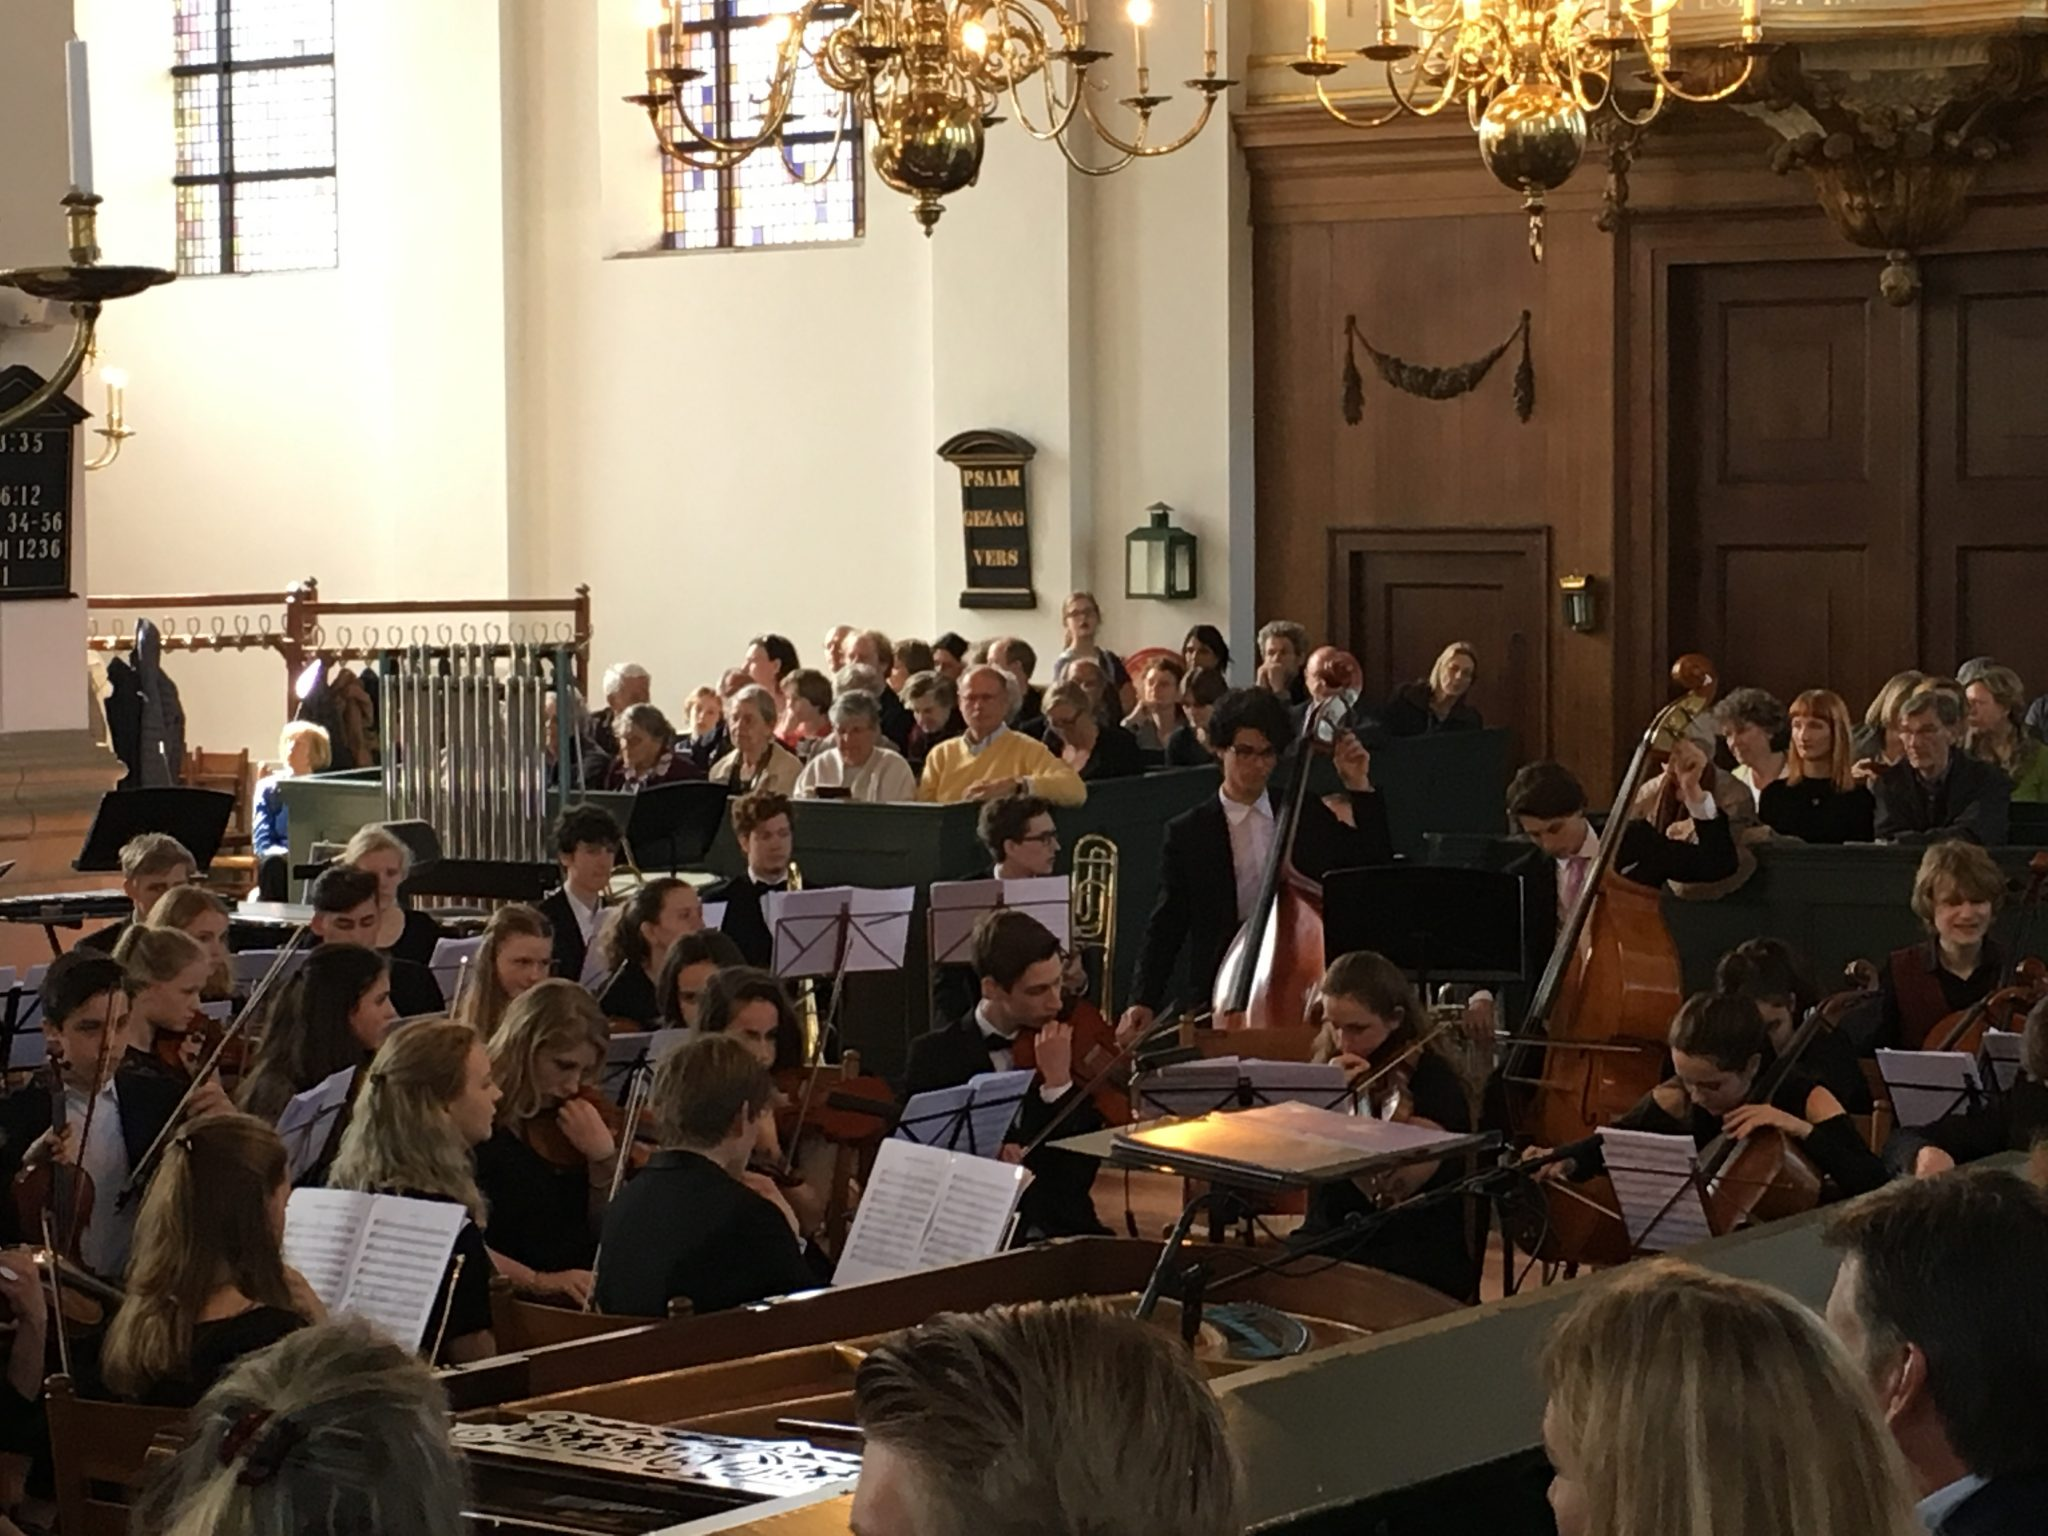 Voorjaarsconcert Nieuwe Kerk Haarlem